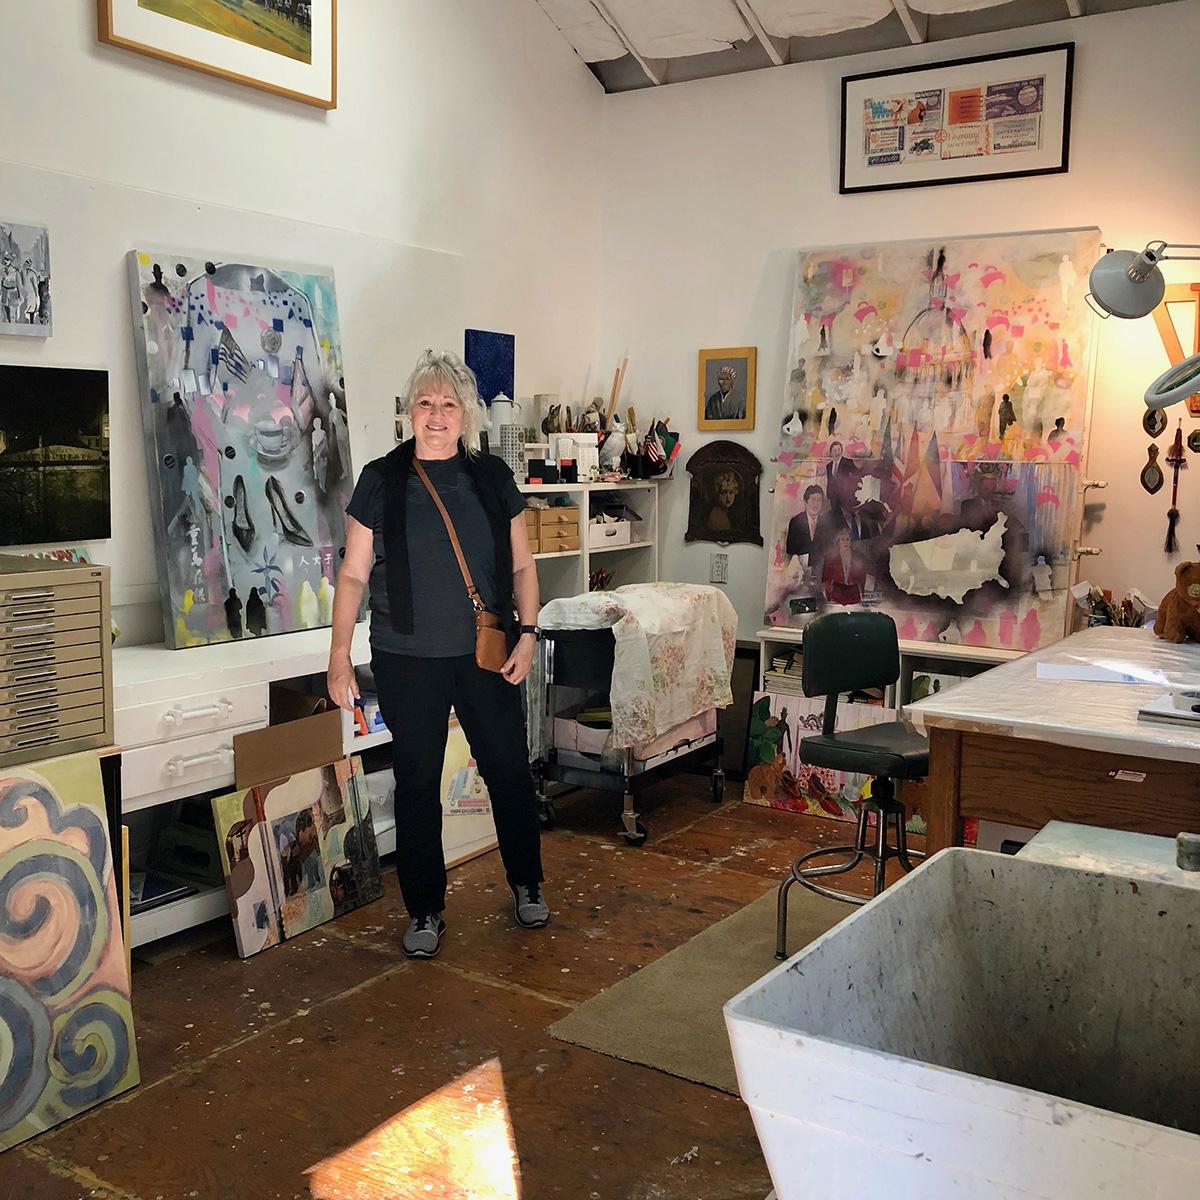 Mo Ni Kai Art Studio - Monica Bryant's open studio for Sonoma County Art Trails October 13, 2018